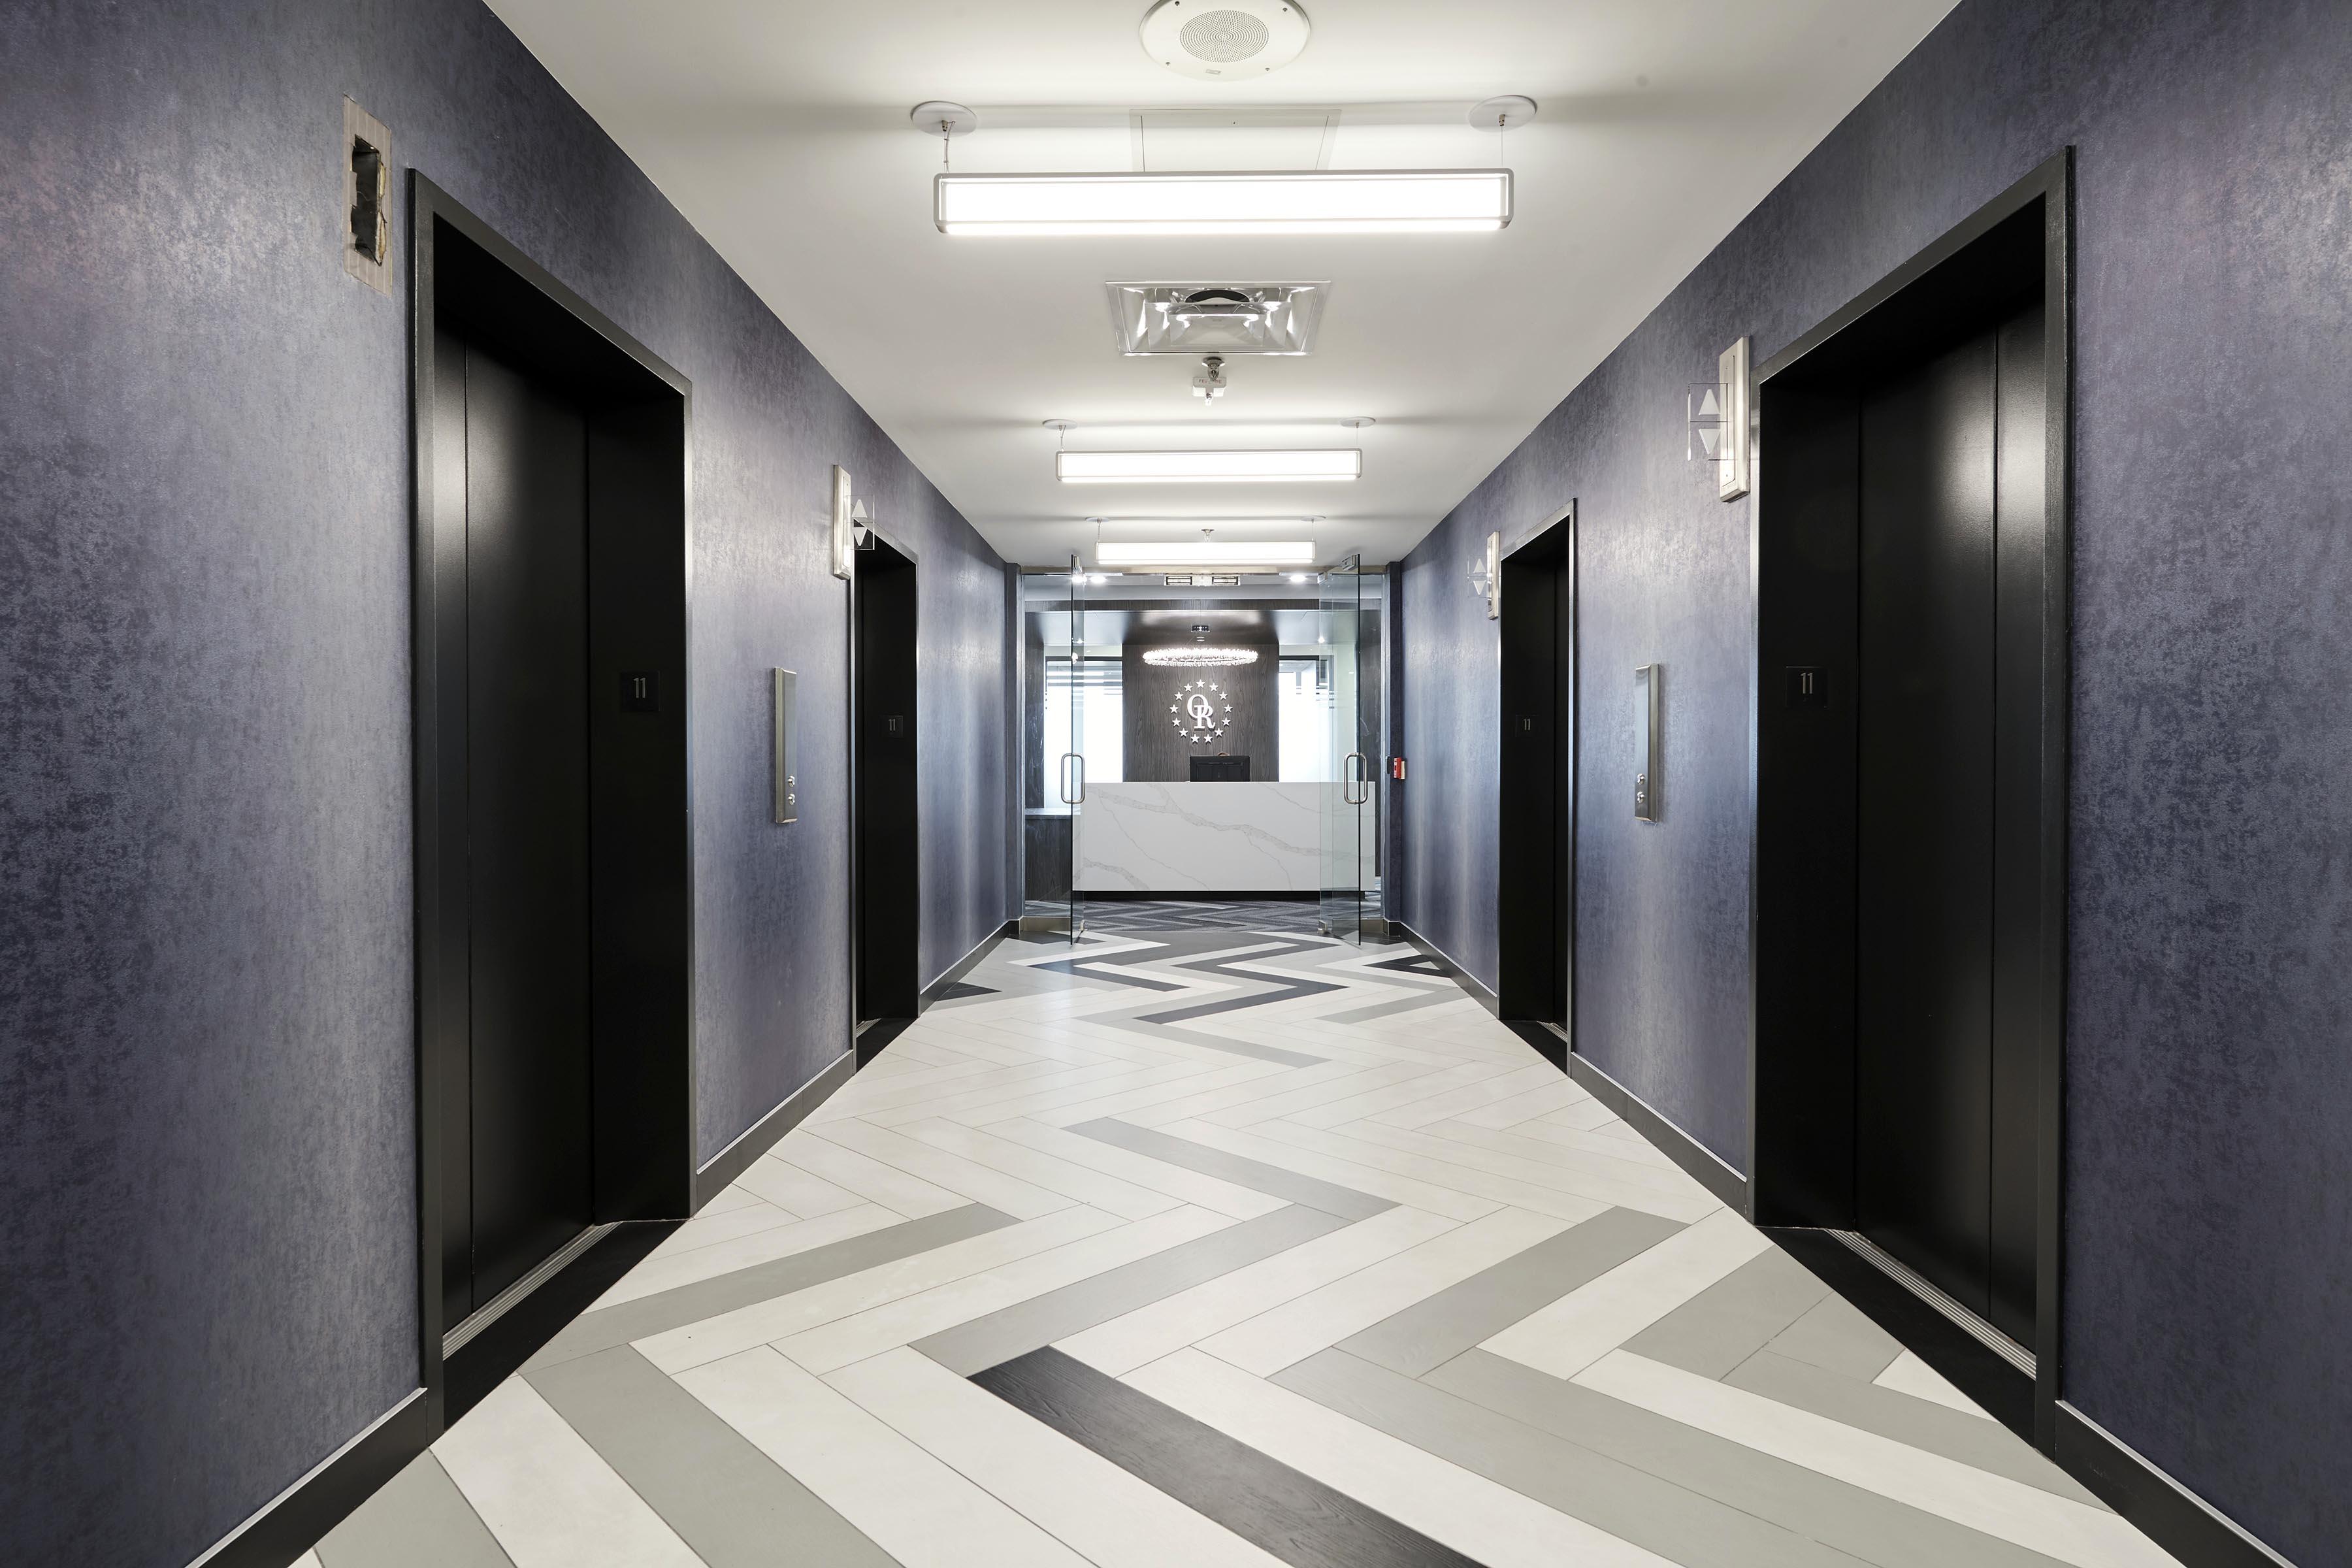 022219 - old_republic-elevator_hallway-3